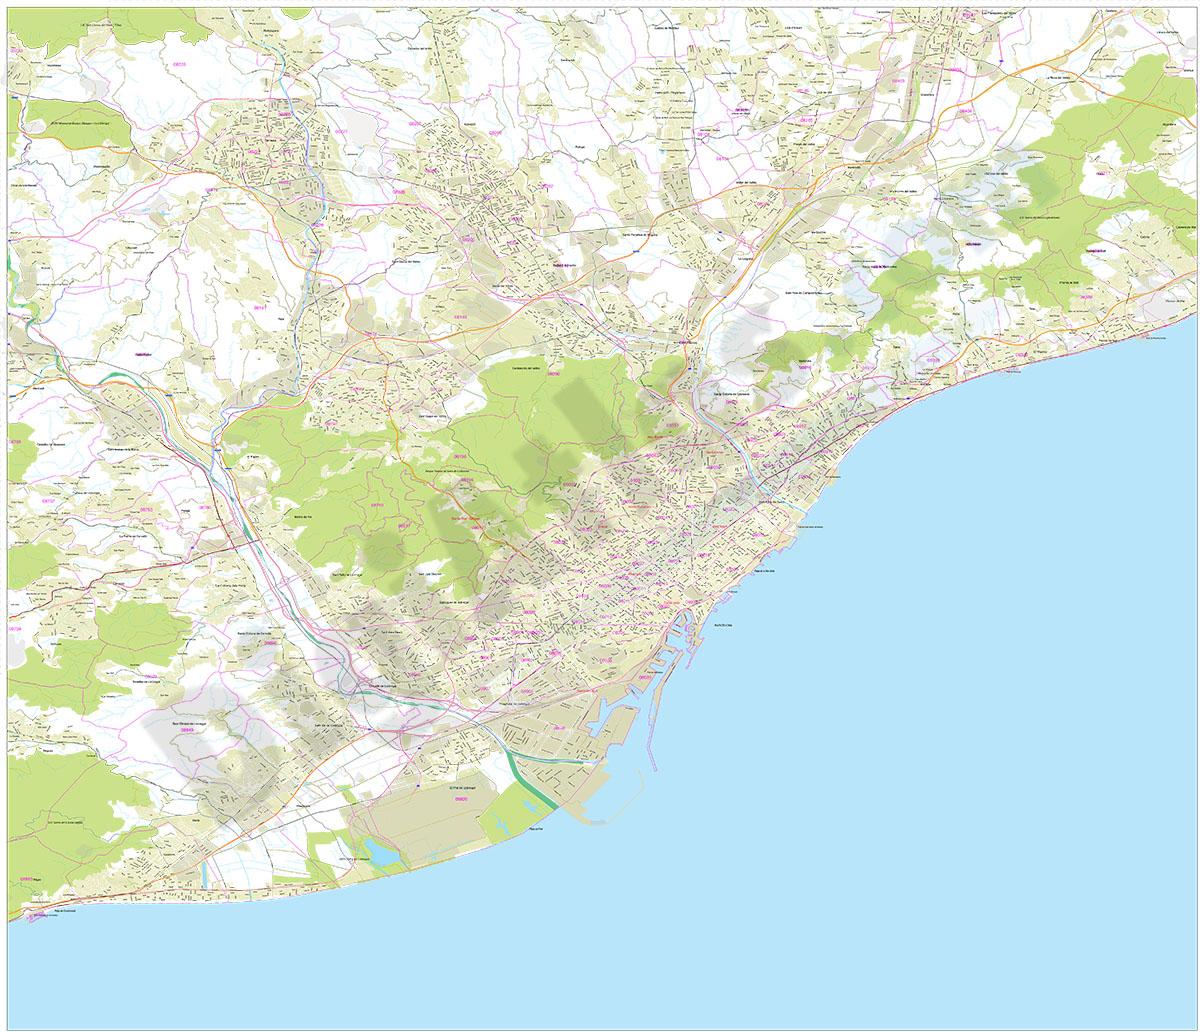 Mapa del Área Metropolitana de Barcelona